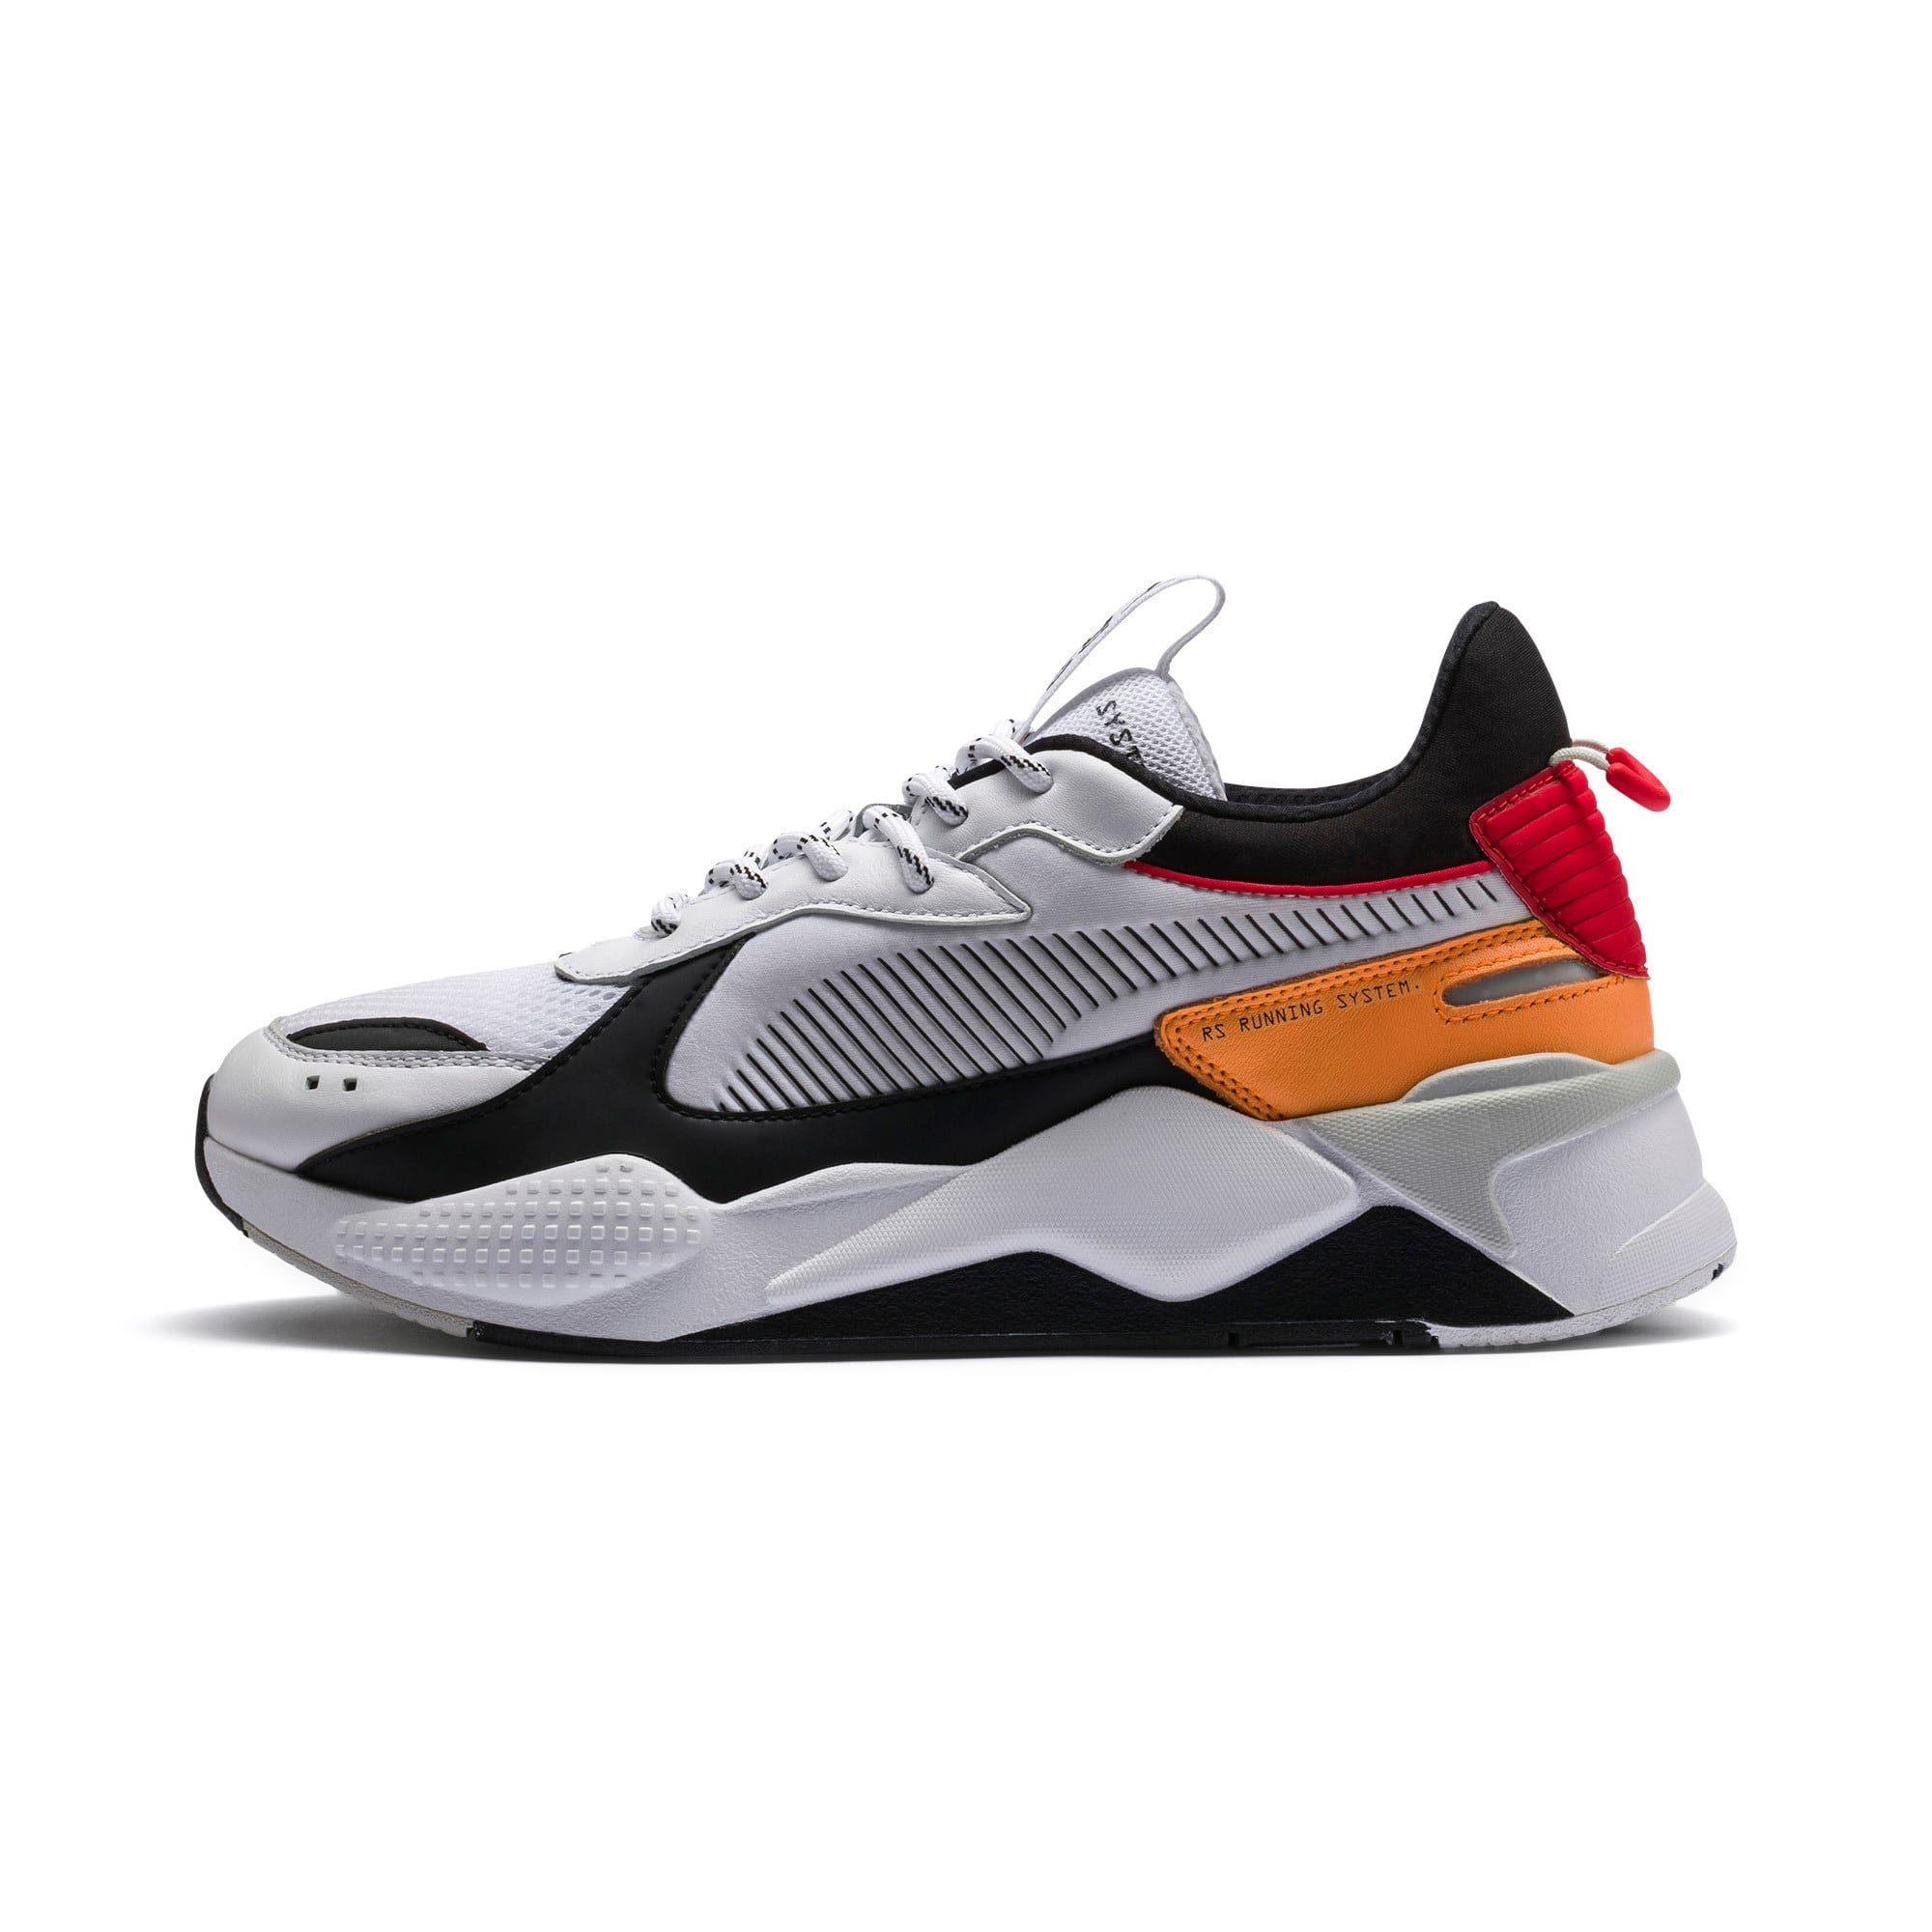 PUMA Chaussure Basket RS-X Tracks, Blanc/Noir, Taille 44.5 ...